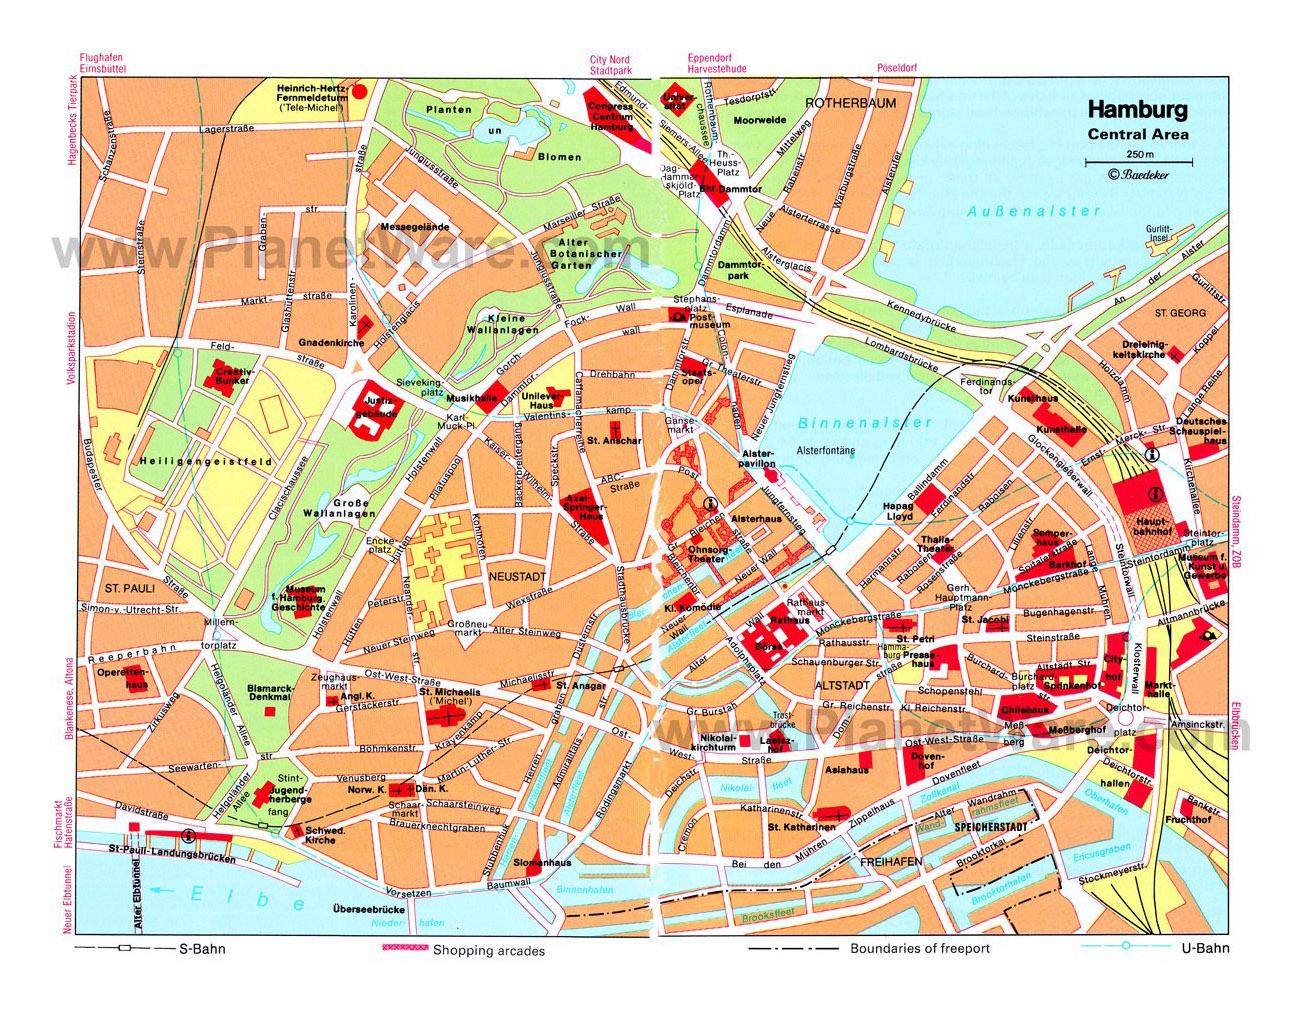 Map Of Germany Hamburg.Detailed Travel Map Of Central Part Of Hamburg City Hamburg